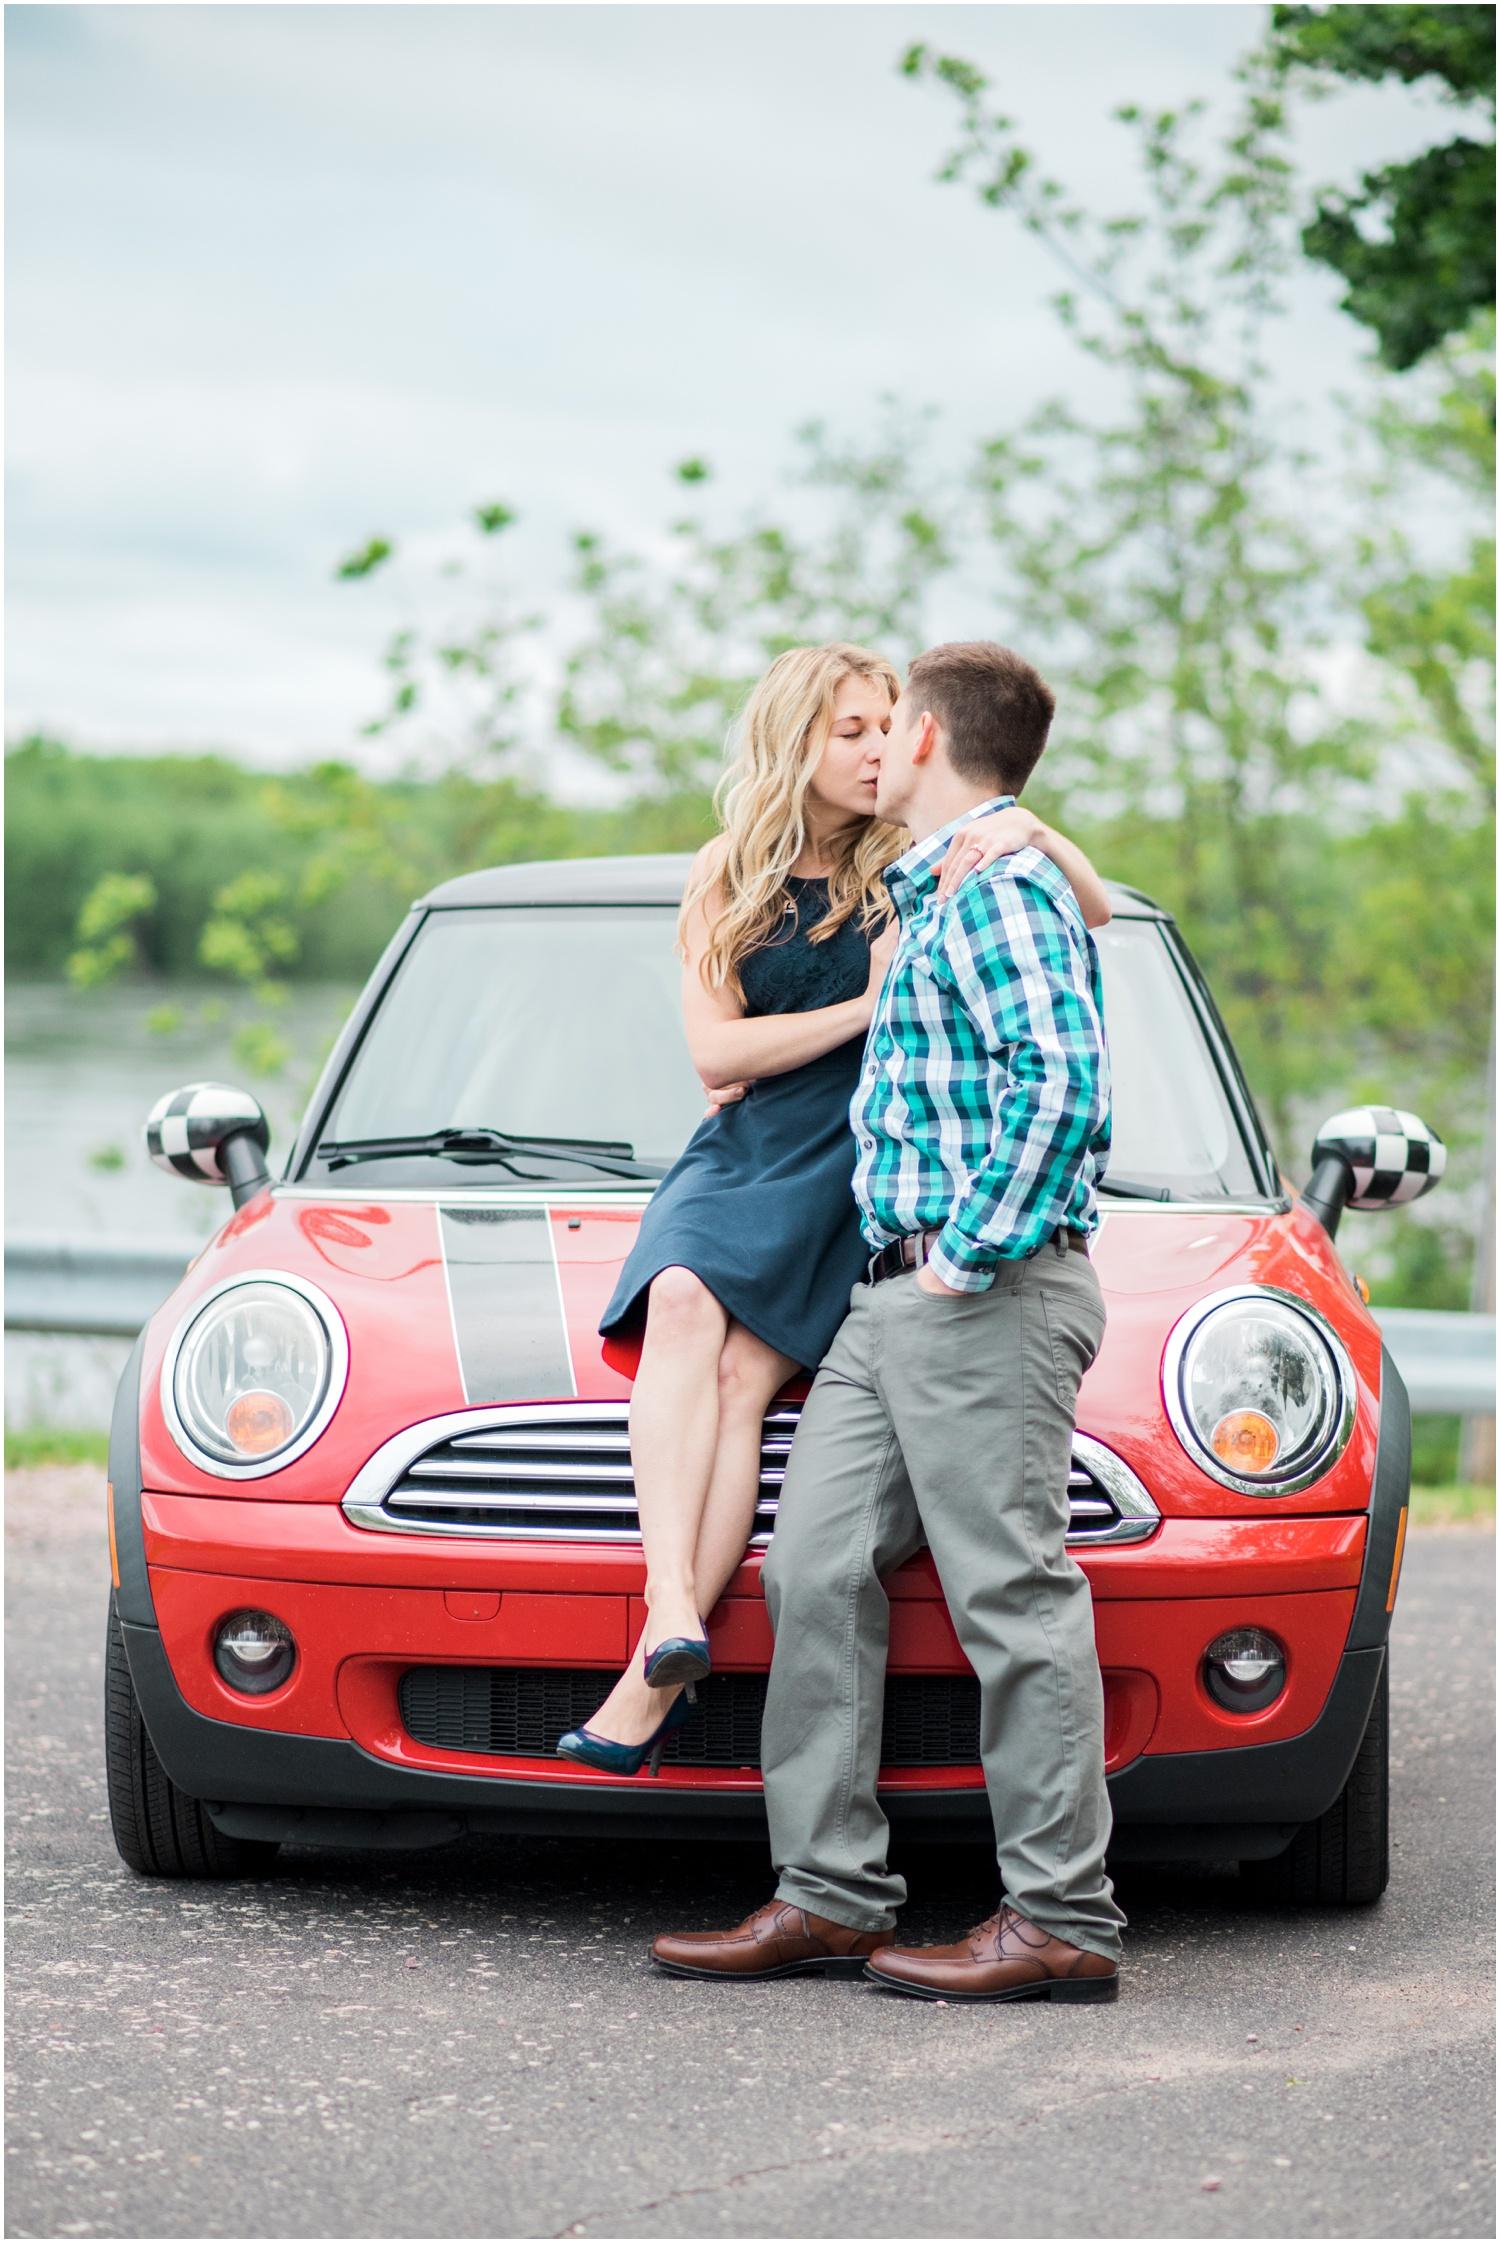 Paquette_Park_Portage_WI_Engagement_Photos_Heather_and_Derek_0039.jpg